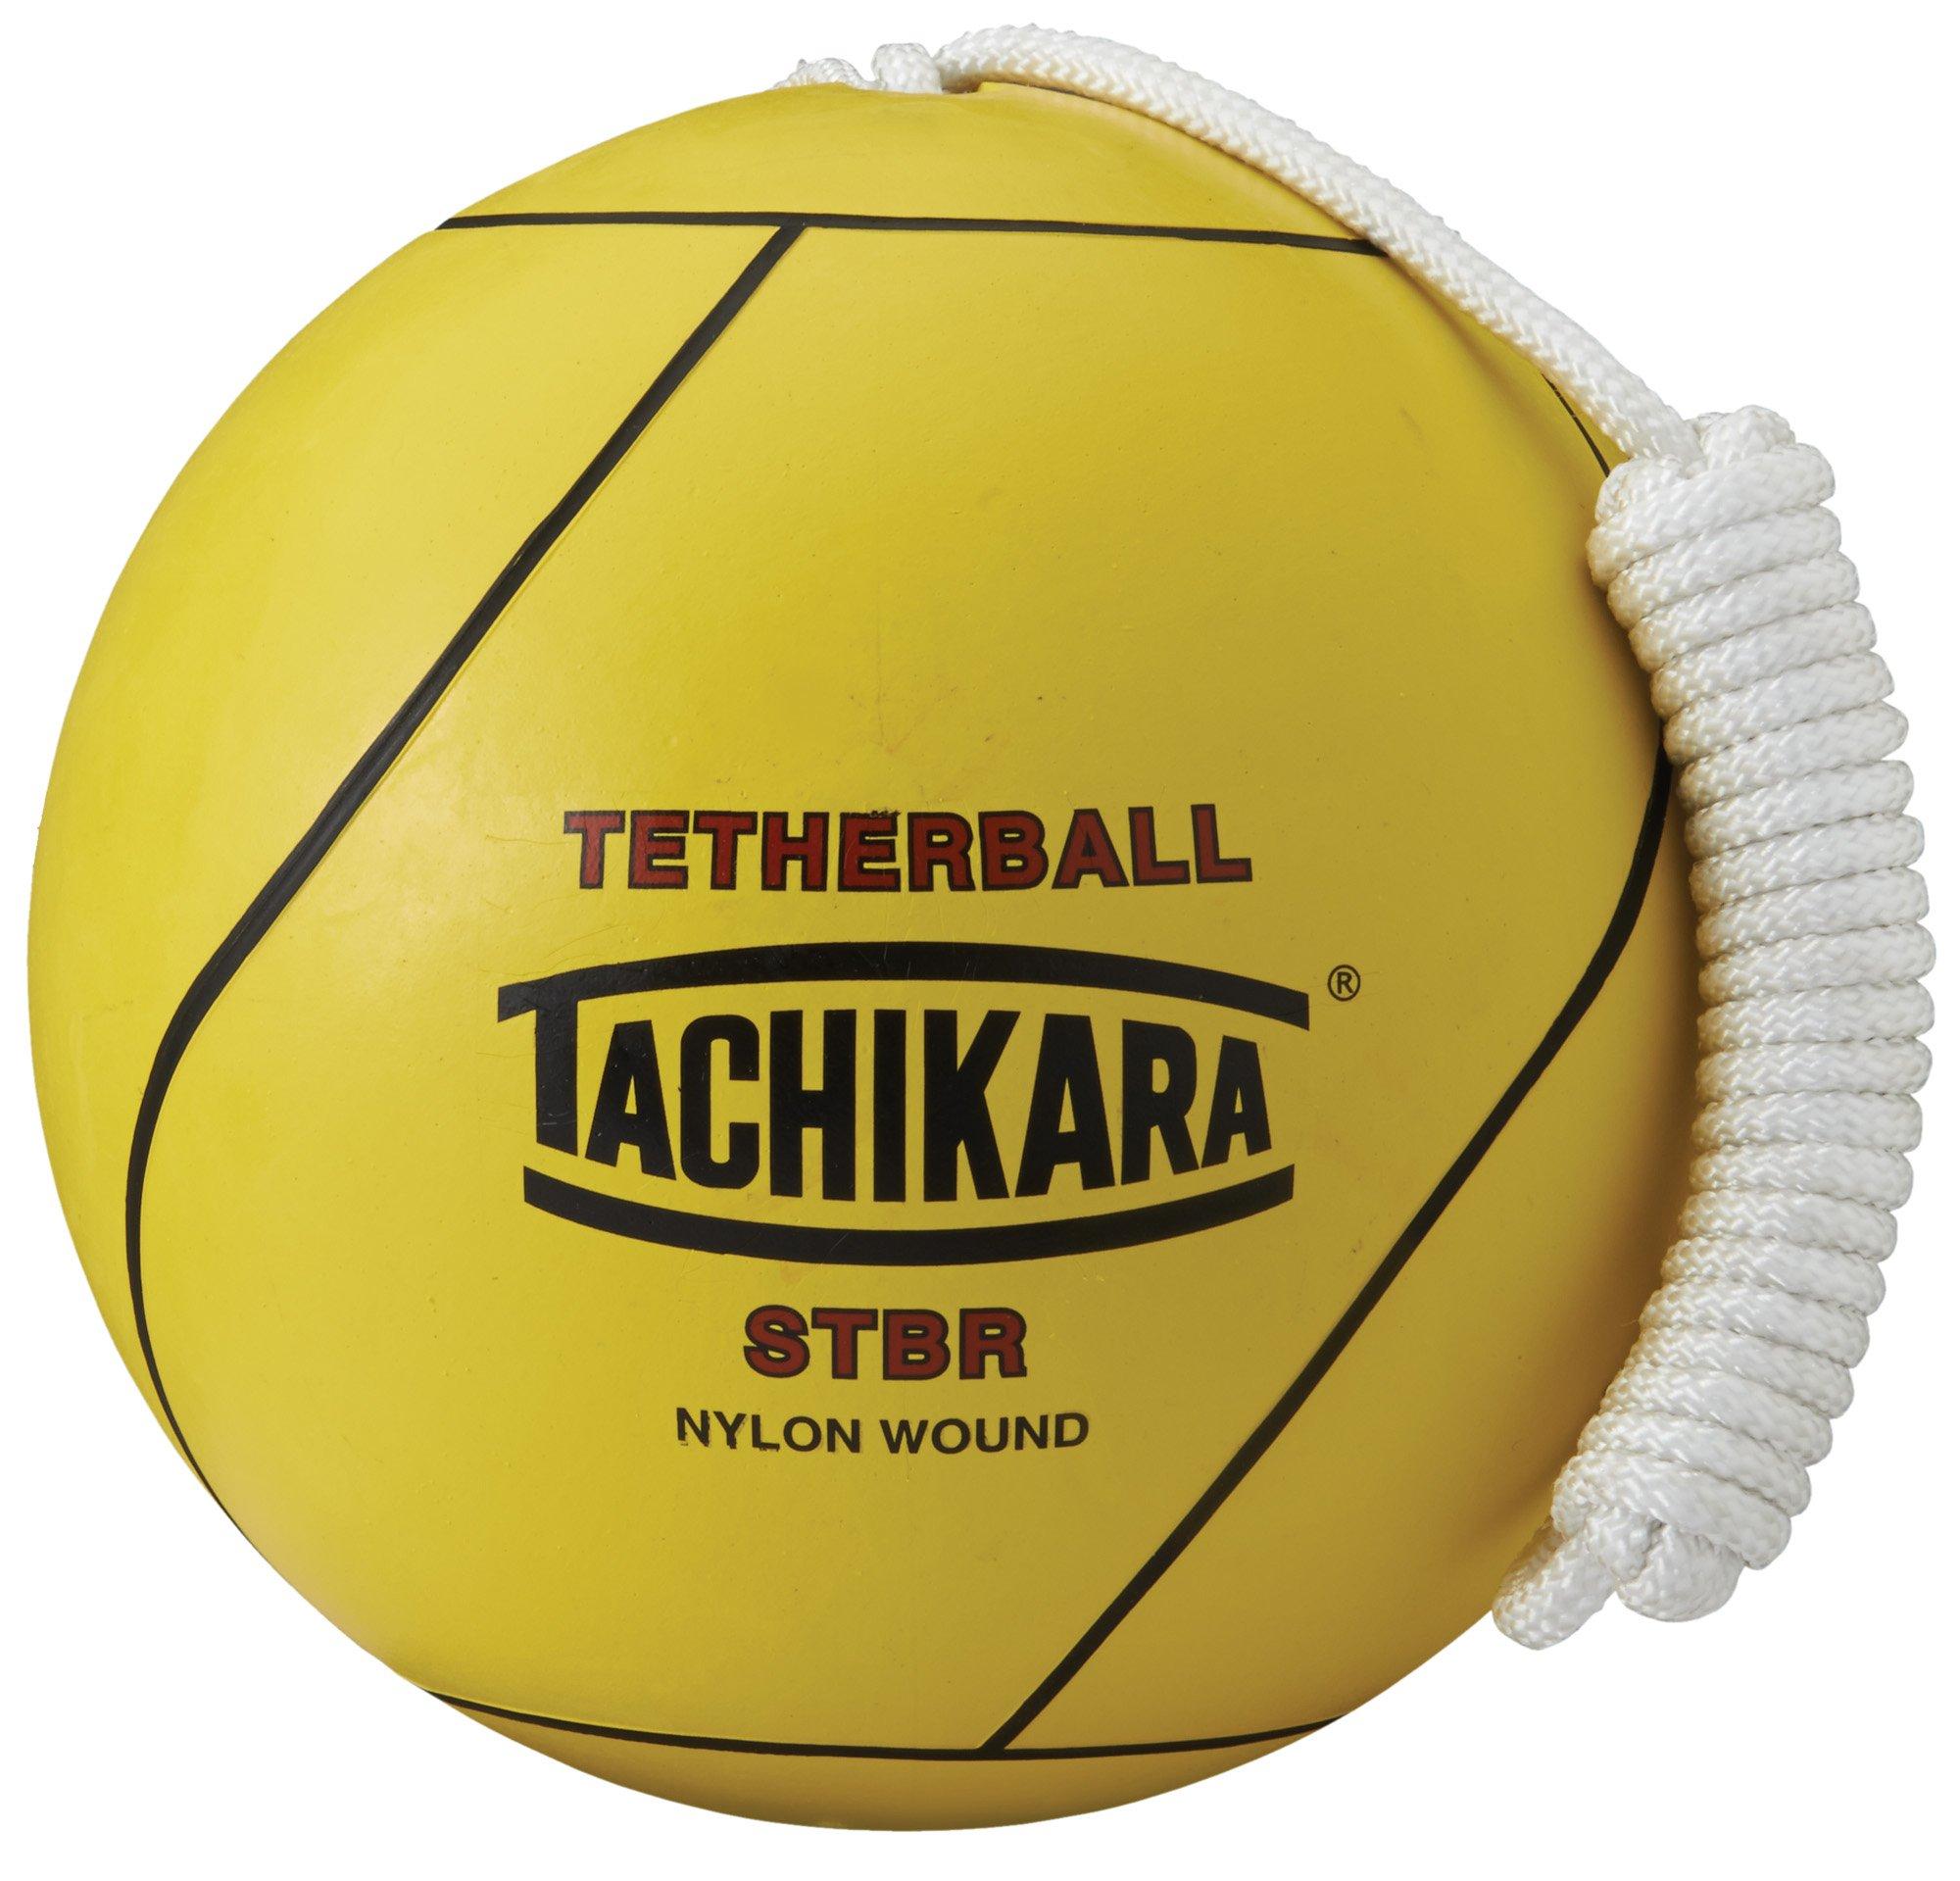 TACHIKARA STBR Rubber Tetherball by TACHIKARA